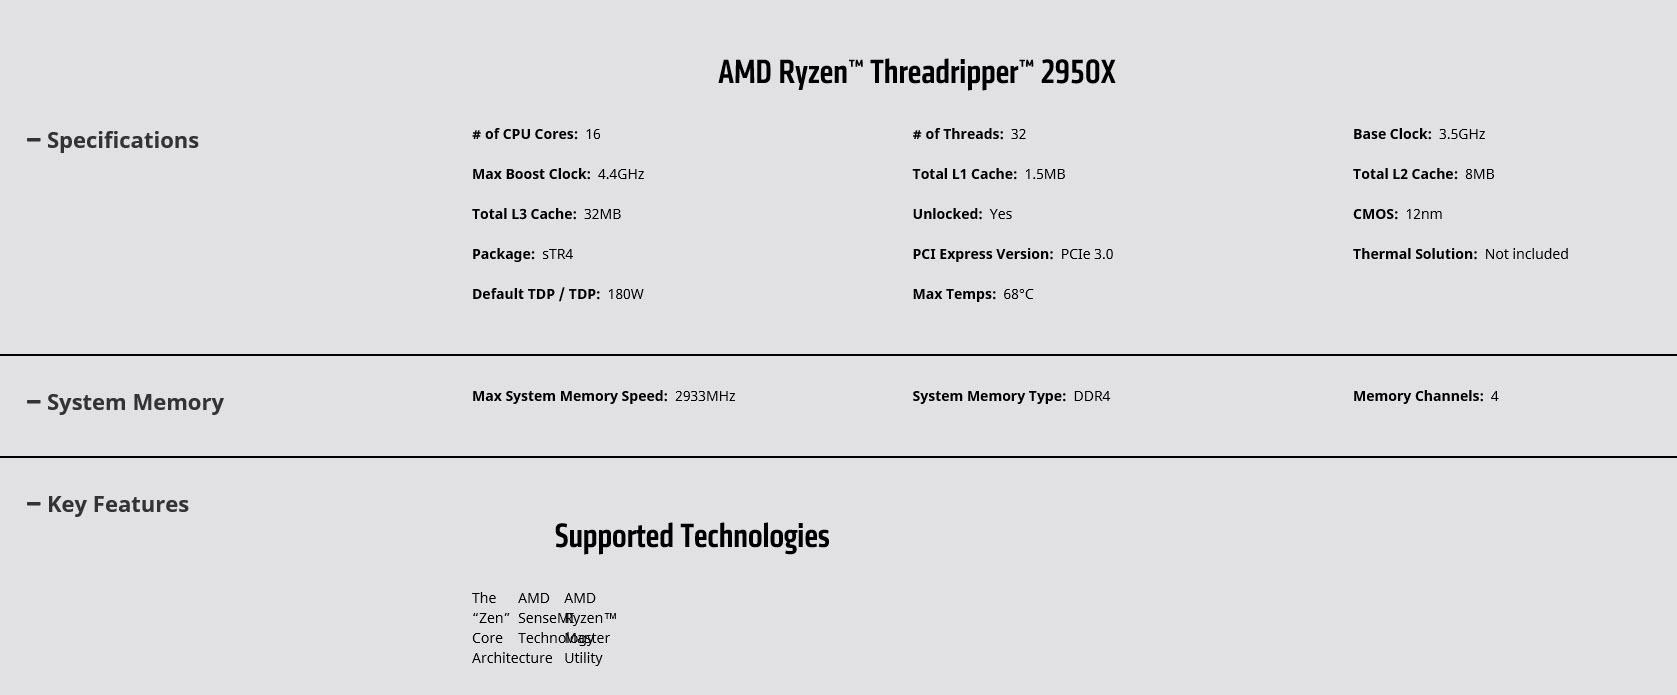 2018 09 01 14 21 43 AMD Ryzen Threadripper 2950X ประสิทธิภาพแรงกว่าคู่แข่งถึง 40เปอร์เซ็นพร้อมวางจำหน่ายแล้ว